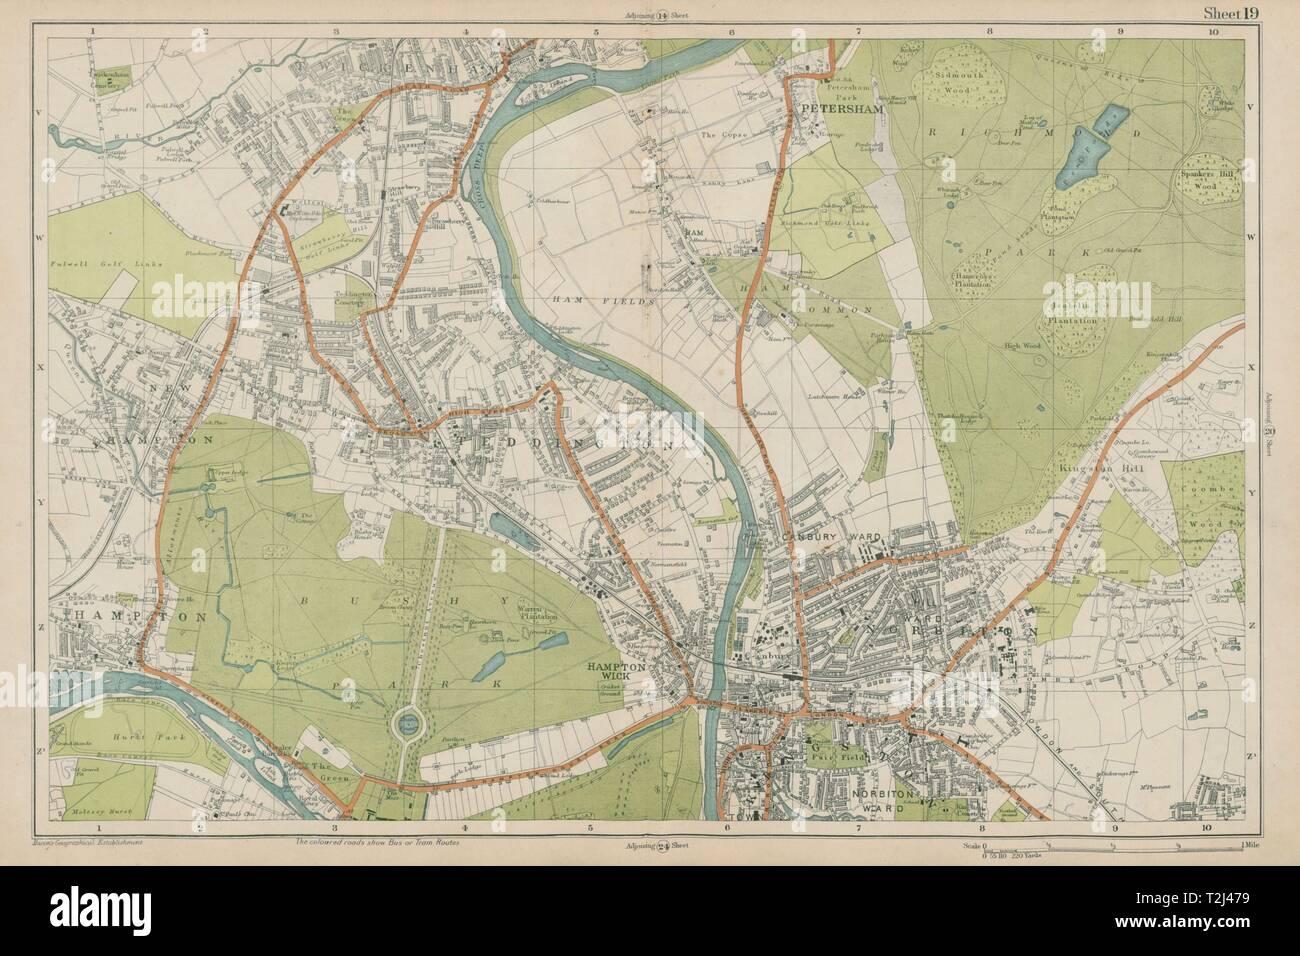 London Sw Map.Sw London Twickenham Kingston Teddington Hampton Richmond Bacon